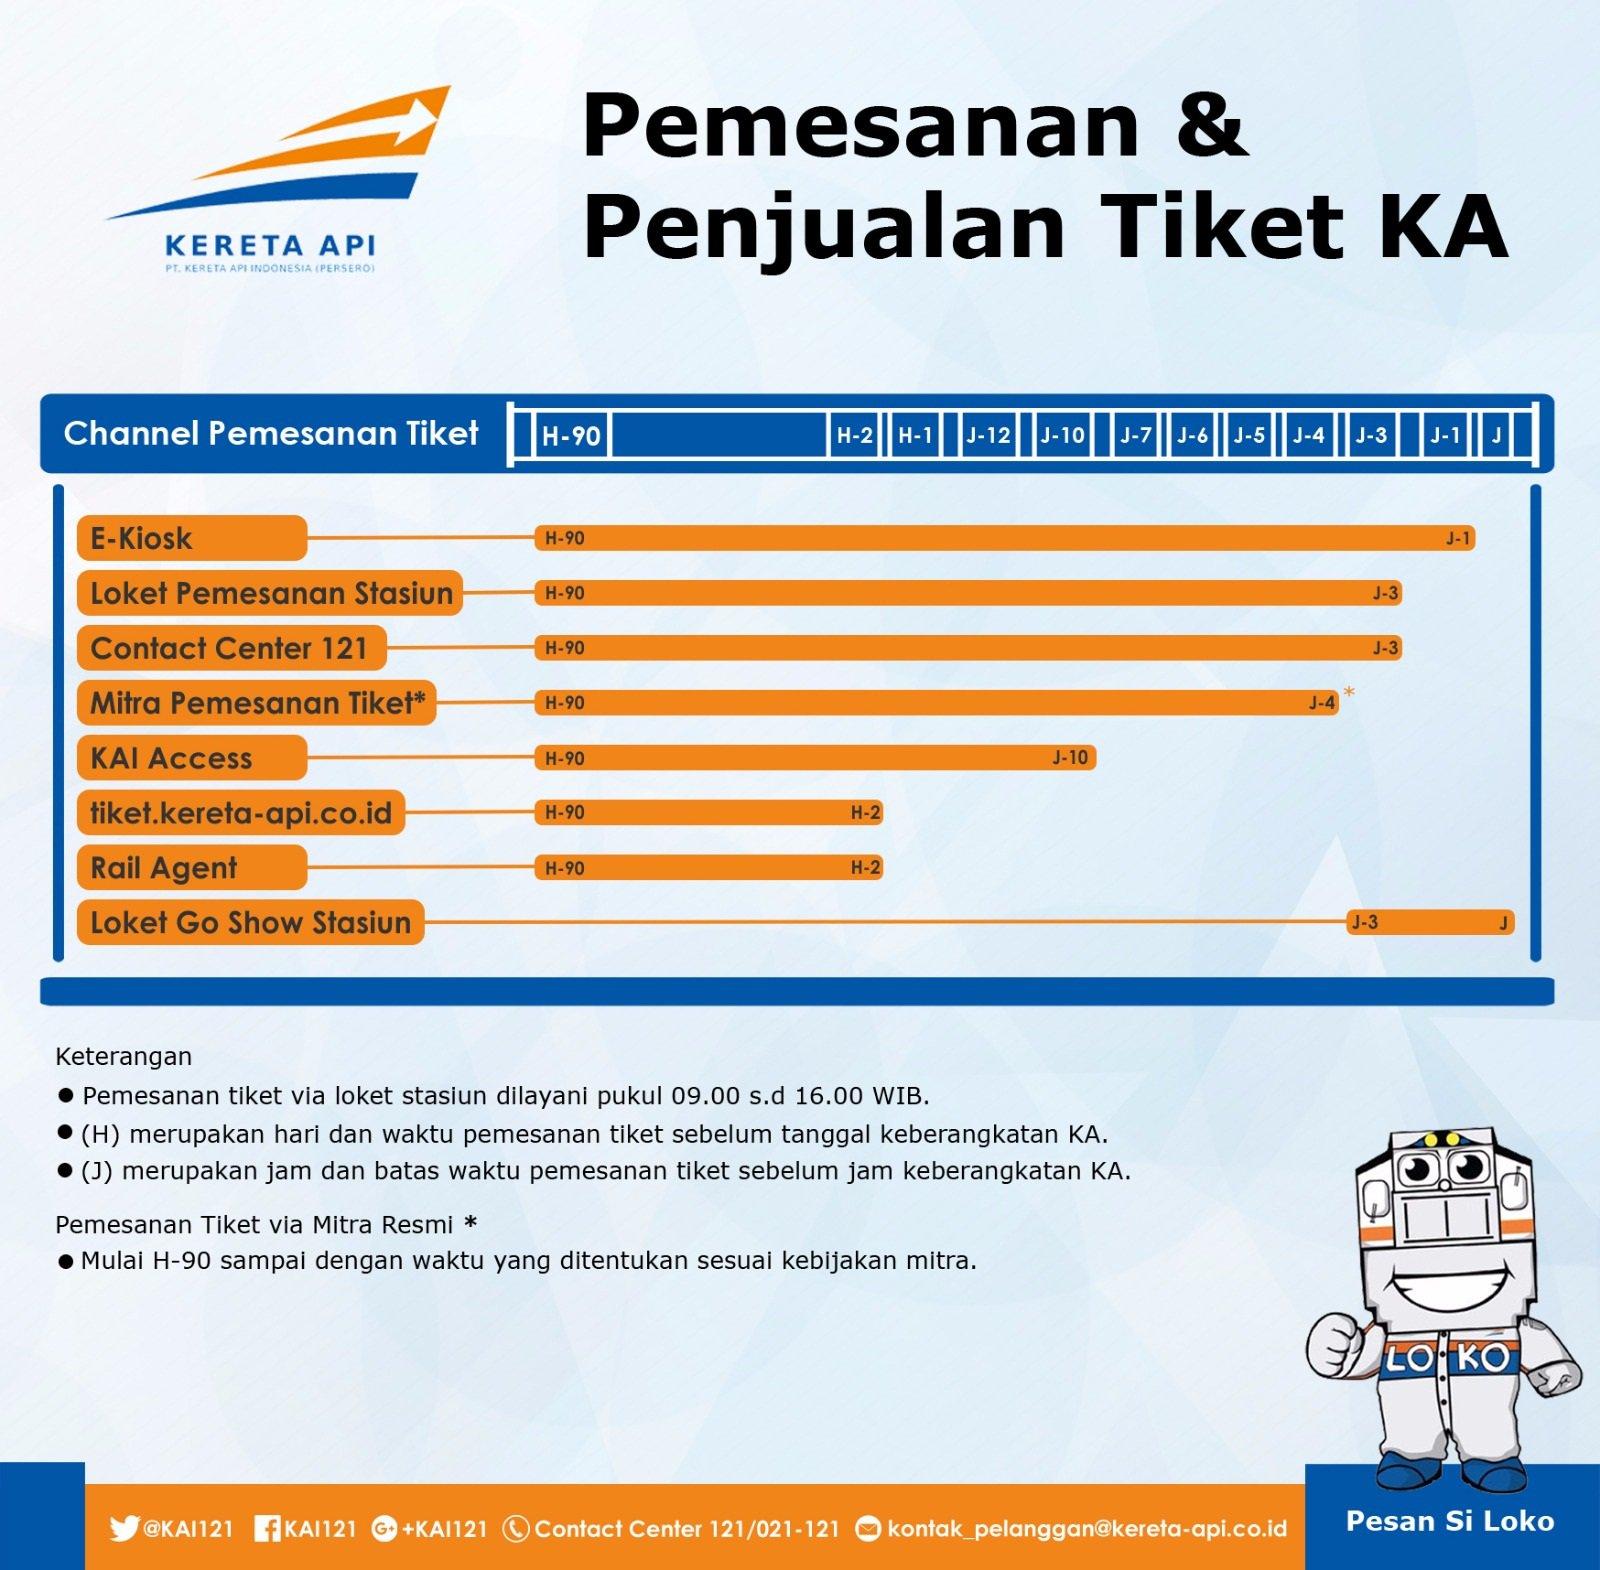 "Kereta Api Indonesia on Twitter: ""Jadwal layanan pemesanan"